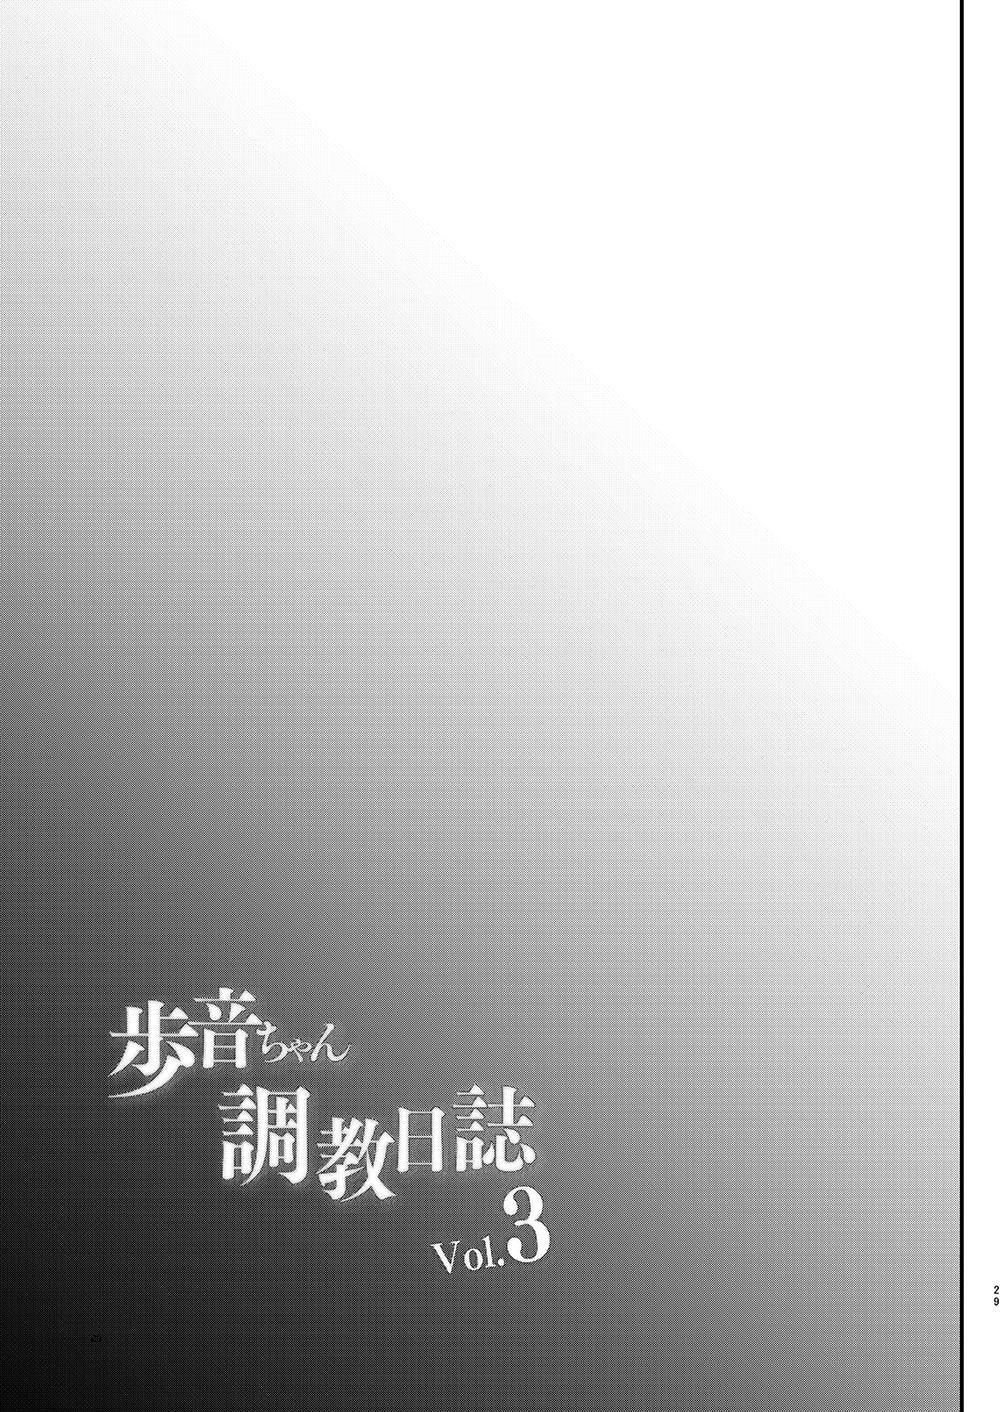 [Shimajiya (Shimaji)] Ayune-chan Choukyou Nisshi Vol. 3 -Gakkou Ecchi Hen- [Digital] 29